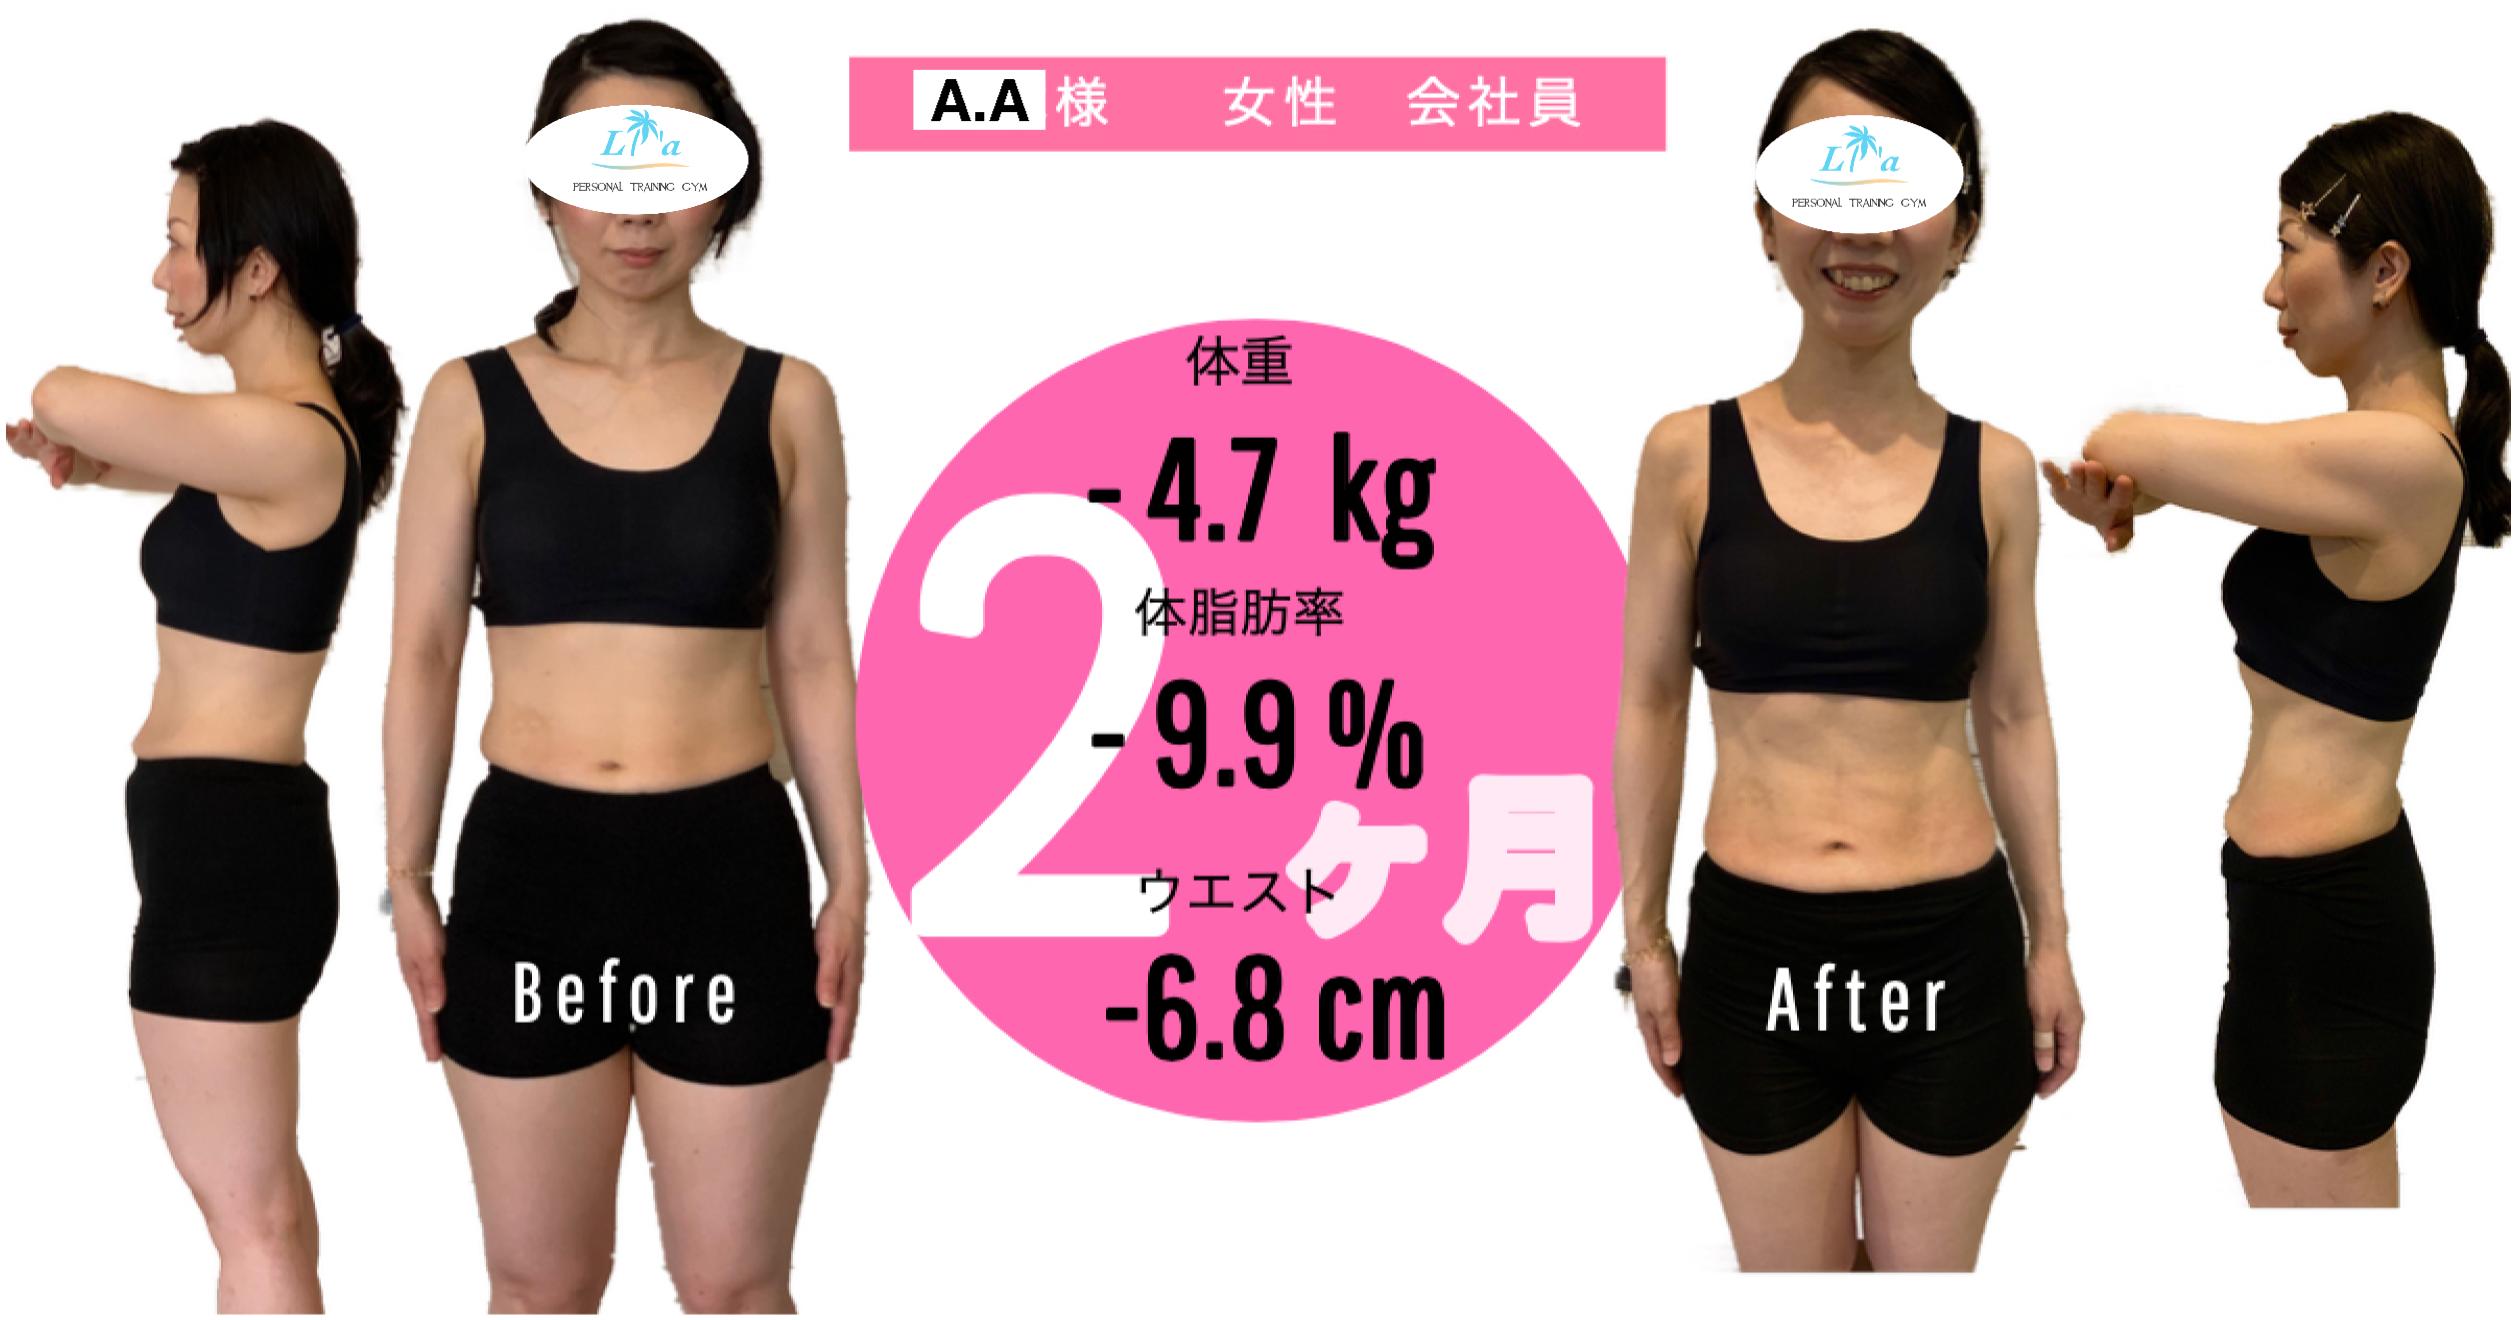 A,A様性会社員、体重-4.7kg 体脂肪-9.9% ウエスト-6.8cmビフォーアフター写真